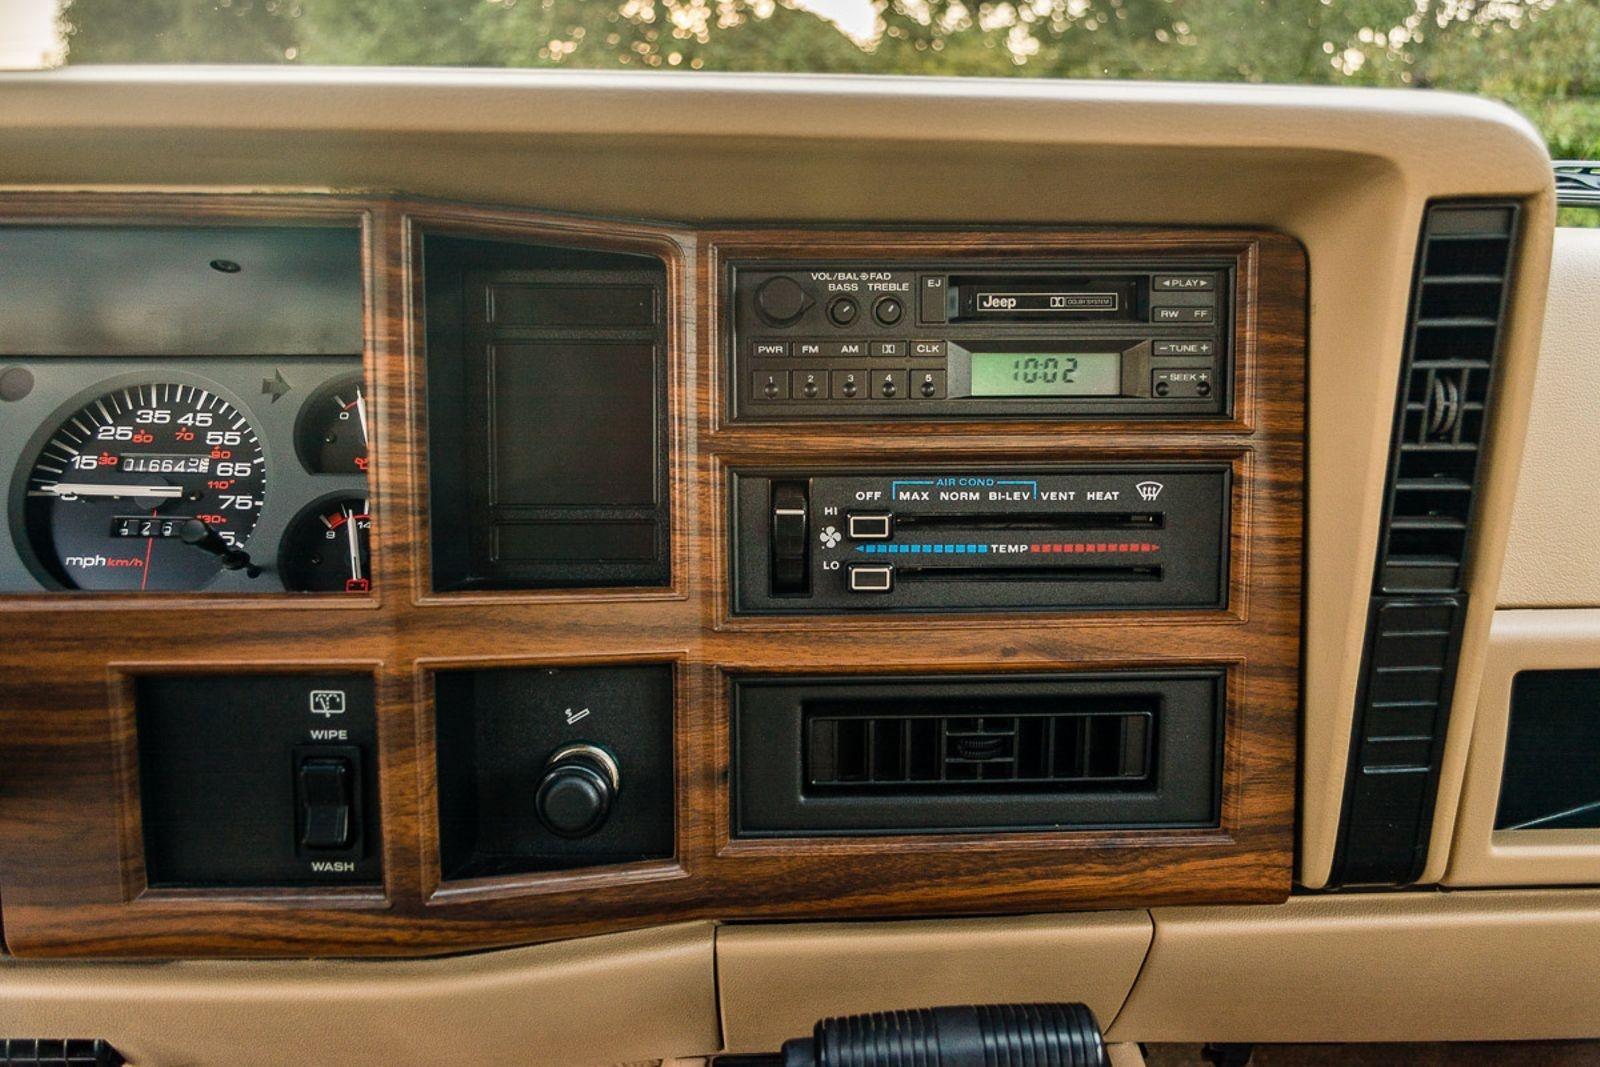 Mini Wagoneer 1992 Jeep Cherokee Briarwood